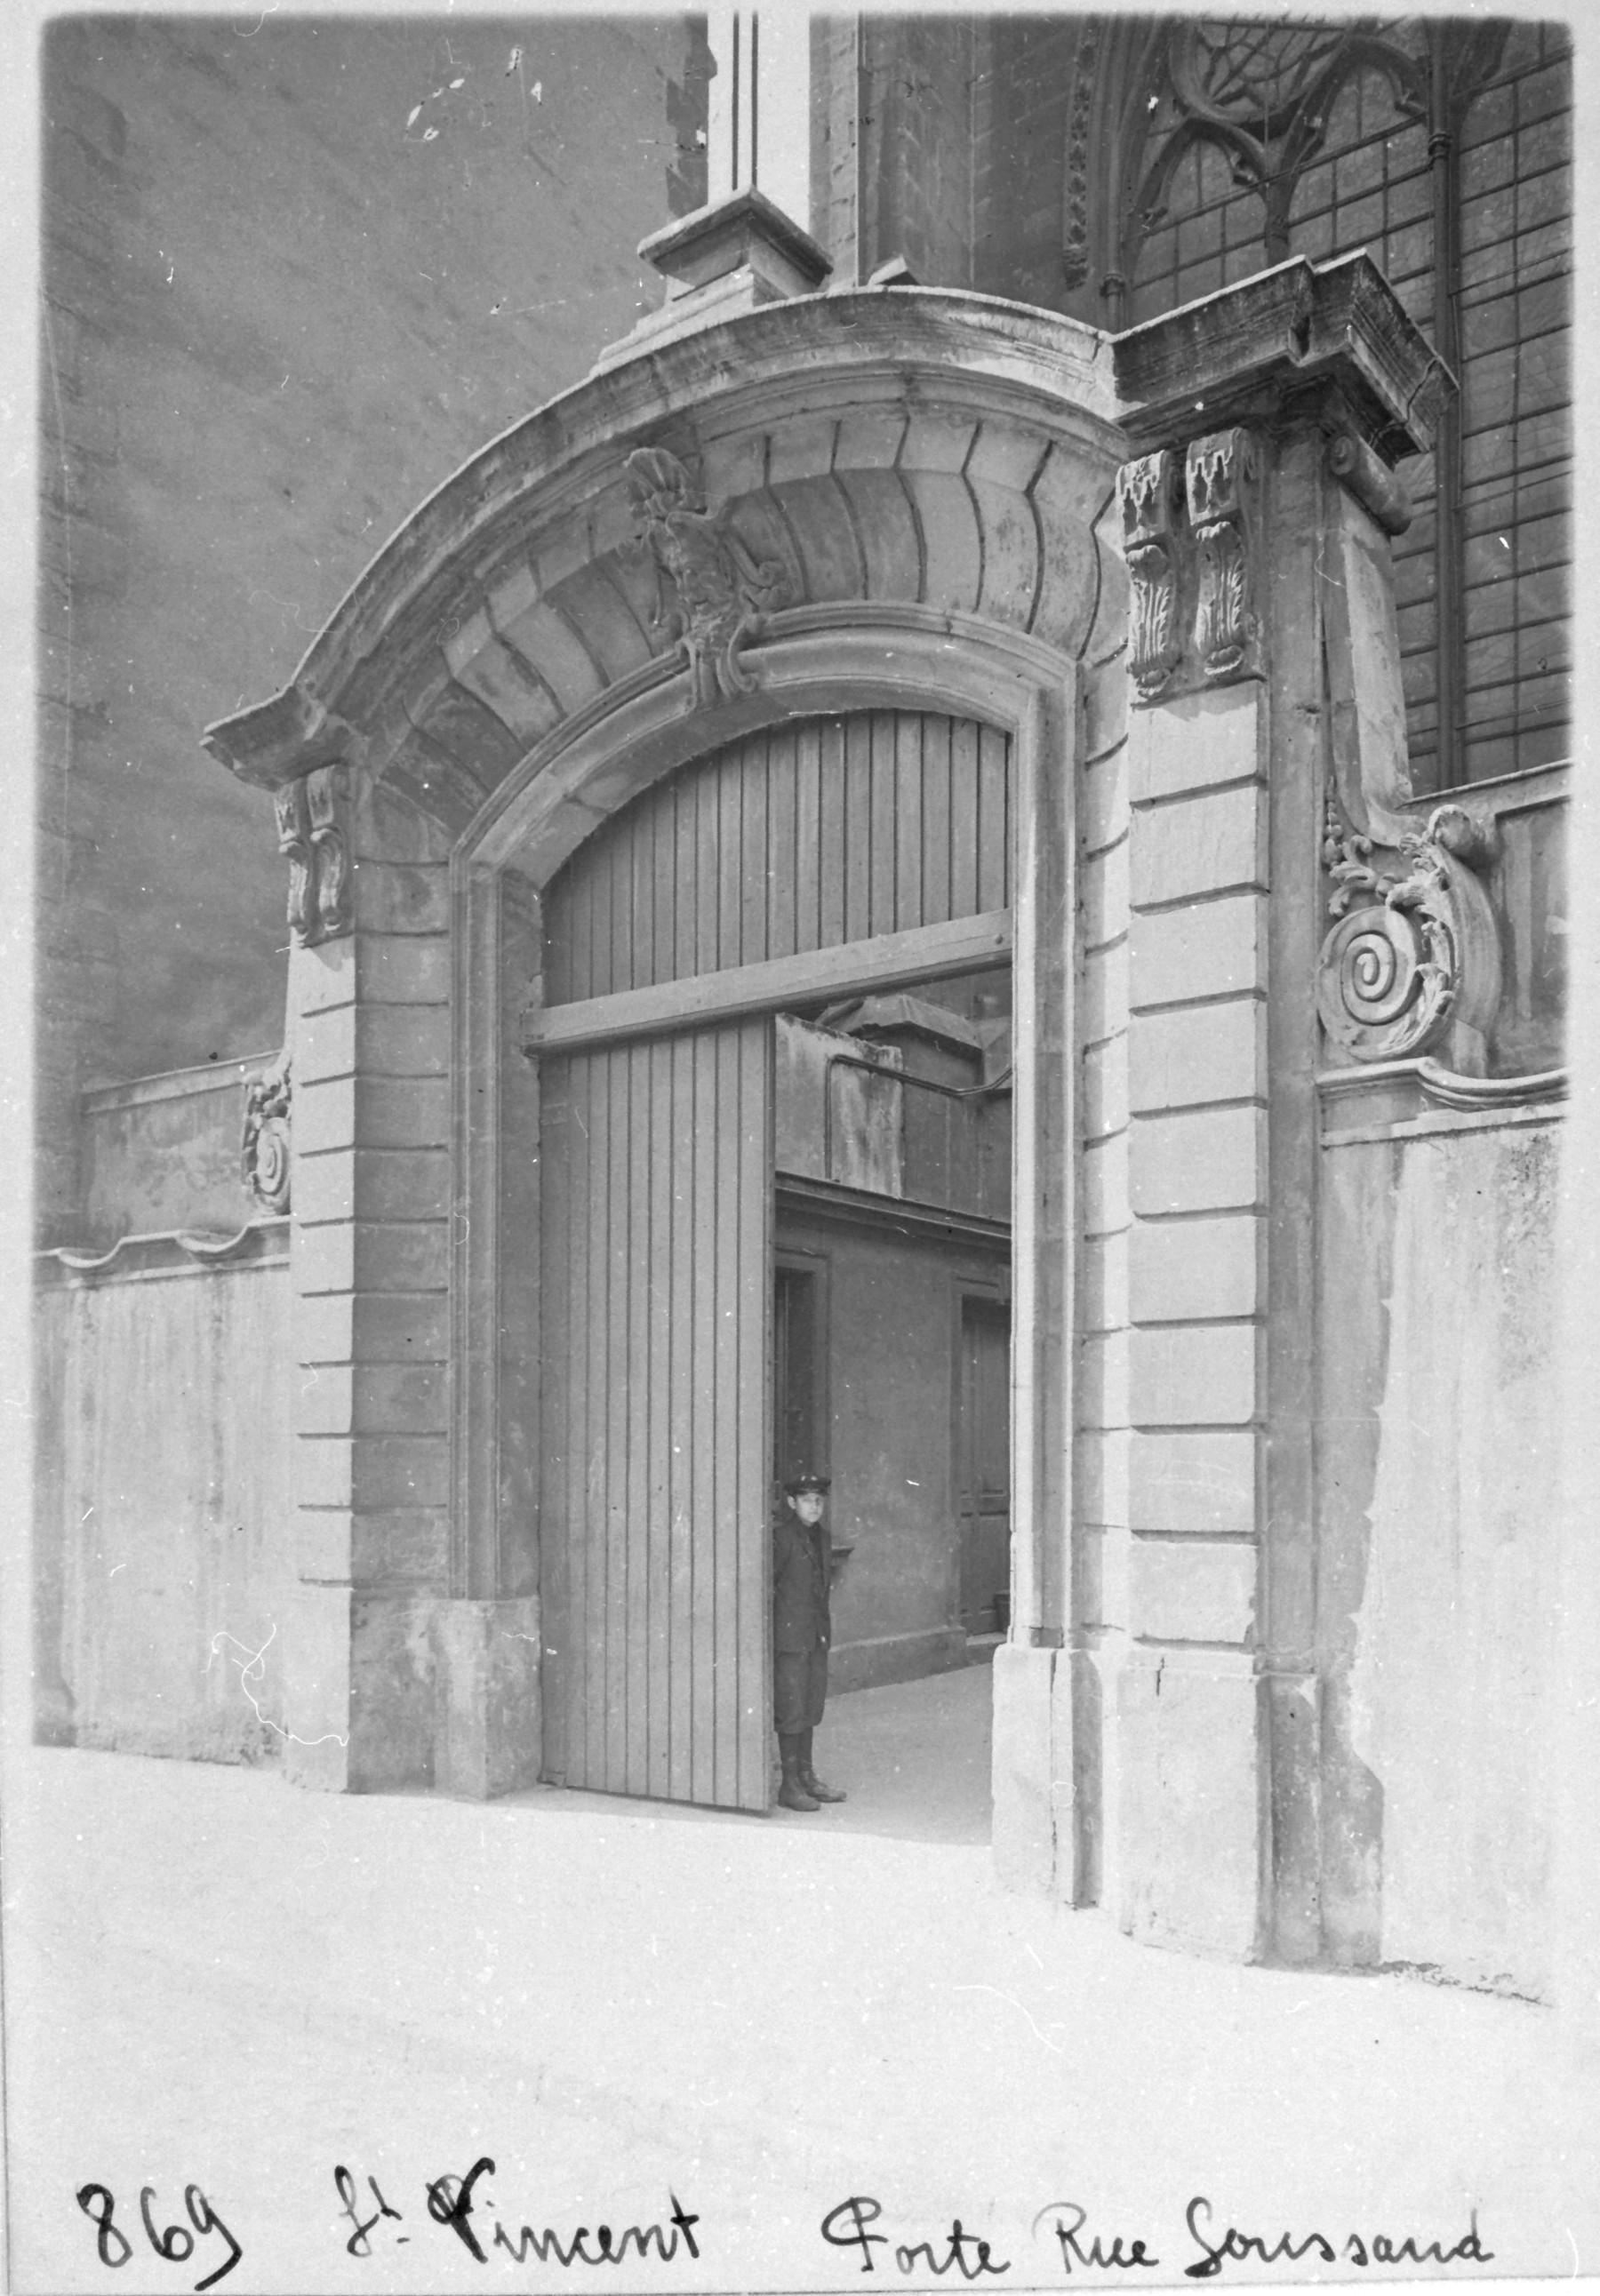 Contenu du Porte rue Goussaud